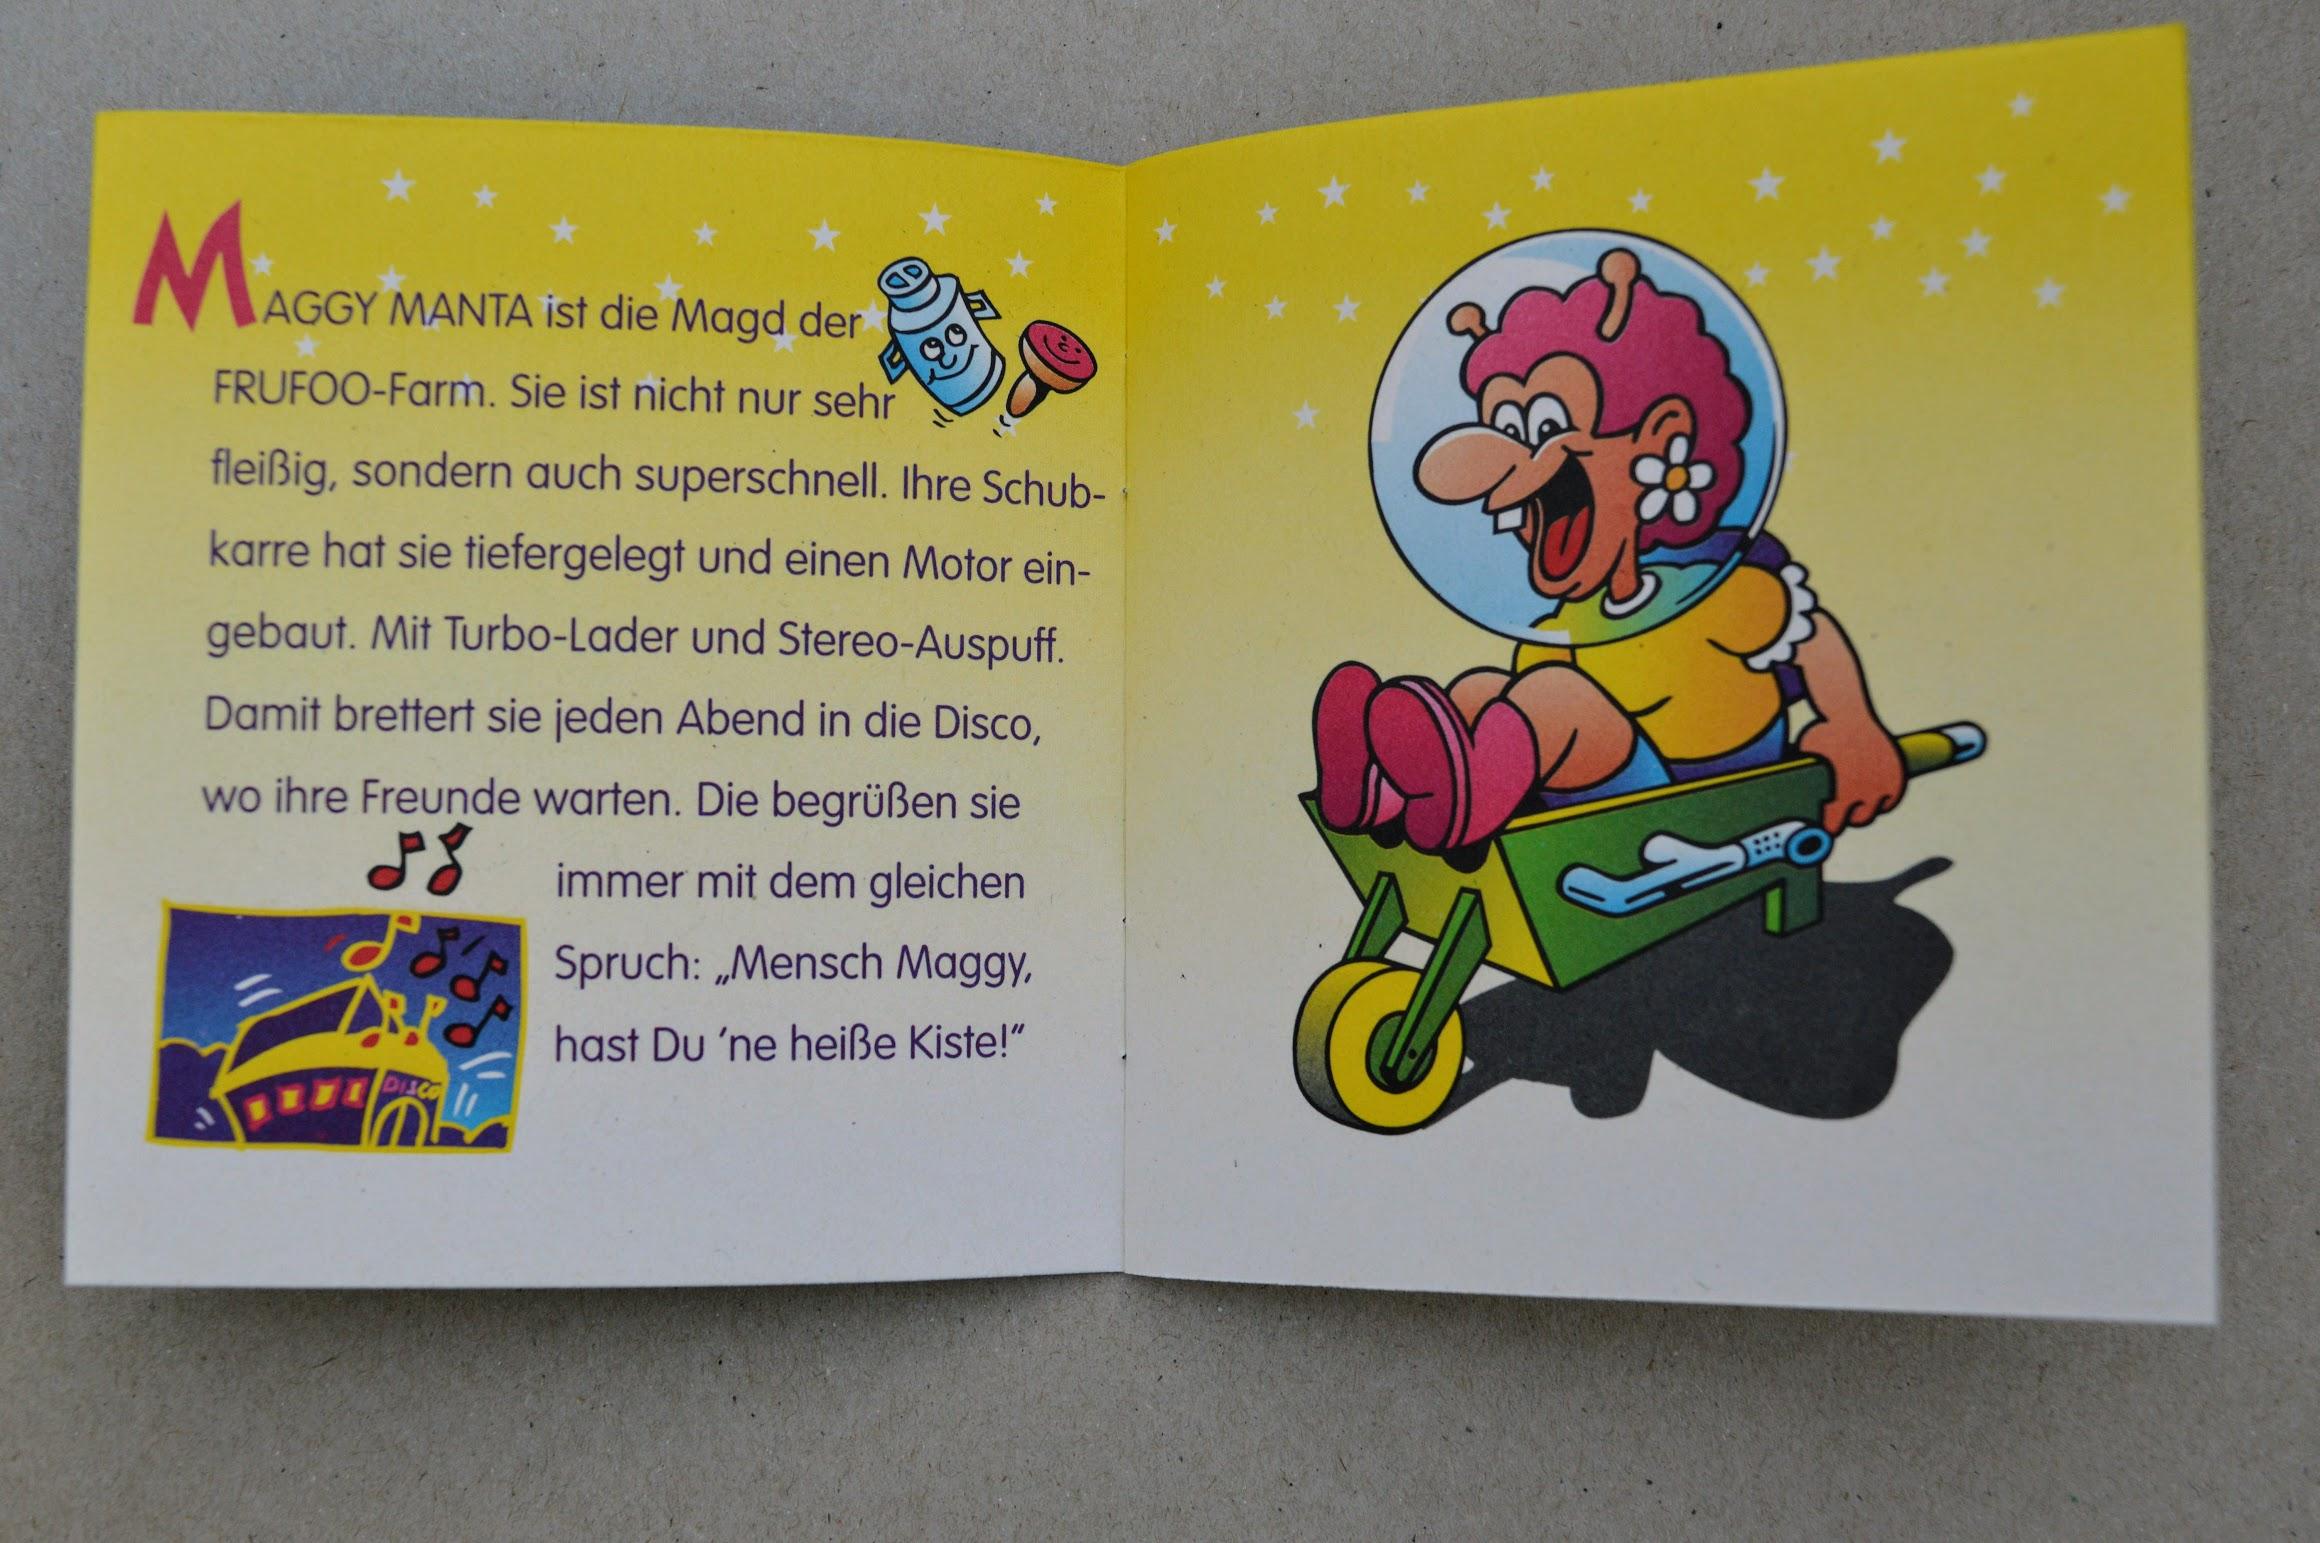 Frufoo Geschichten - Maggy Manta